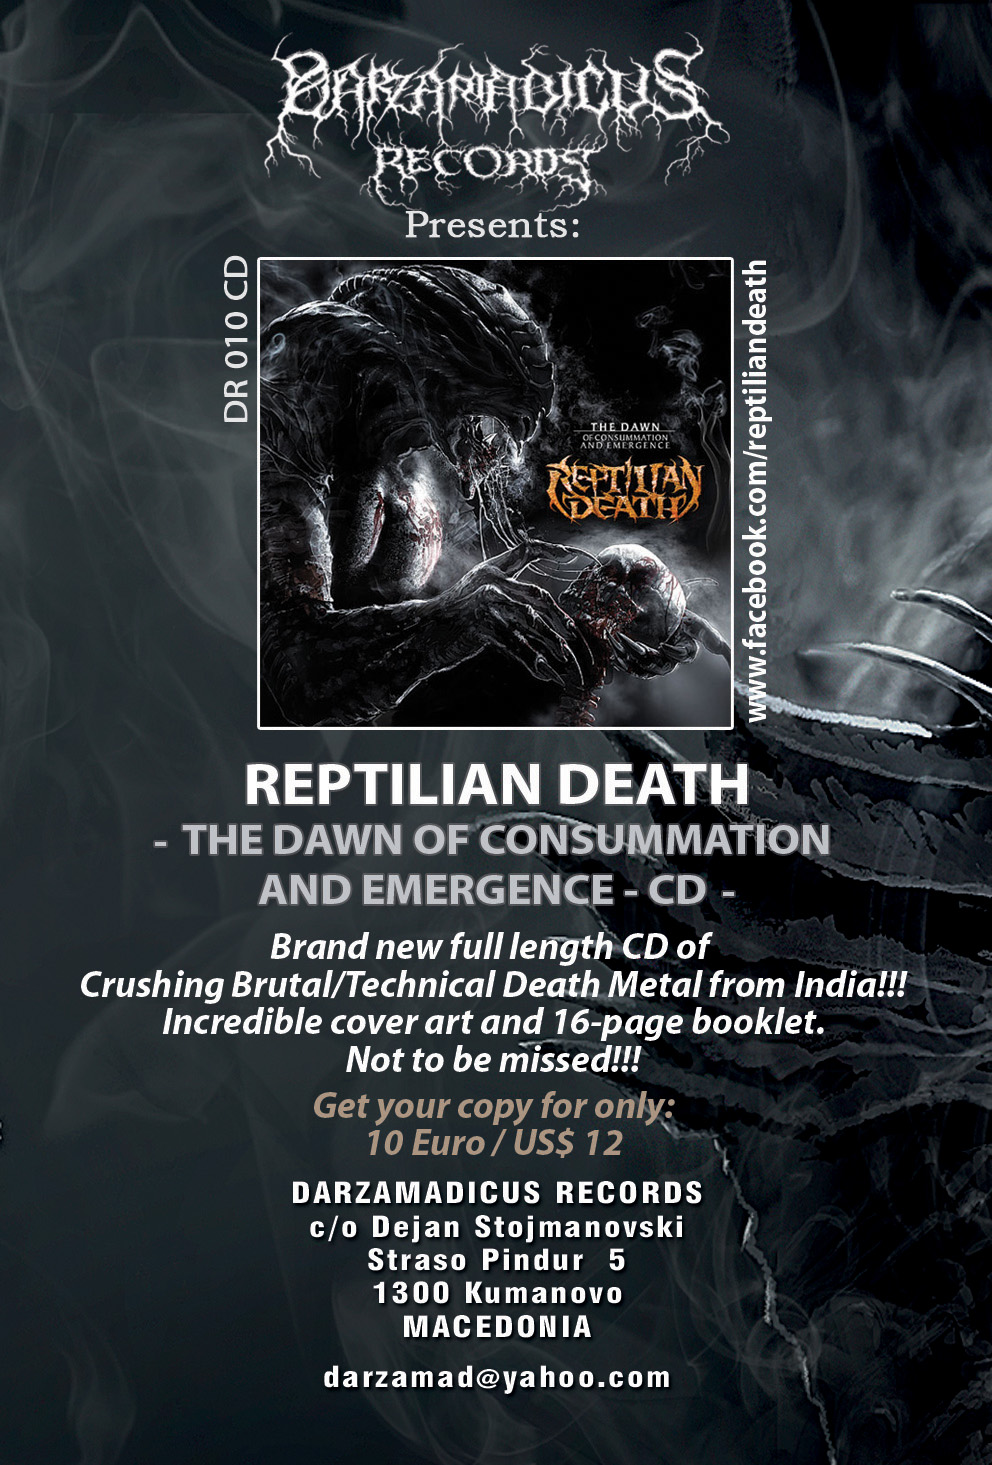 REPTILIAN DEATH SIGNS TO DARZAMADICUS RECORDS